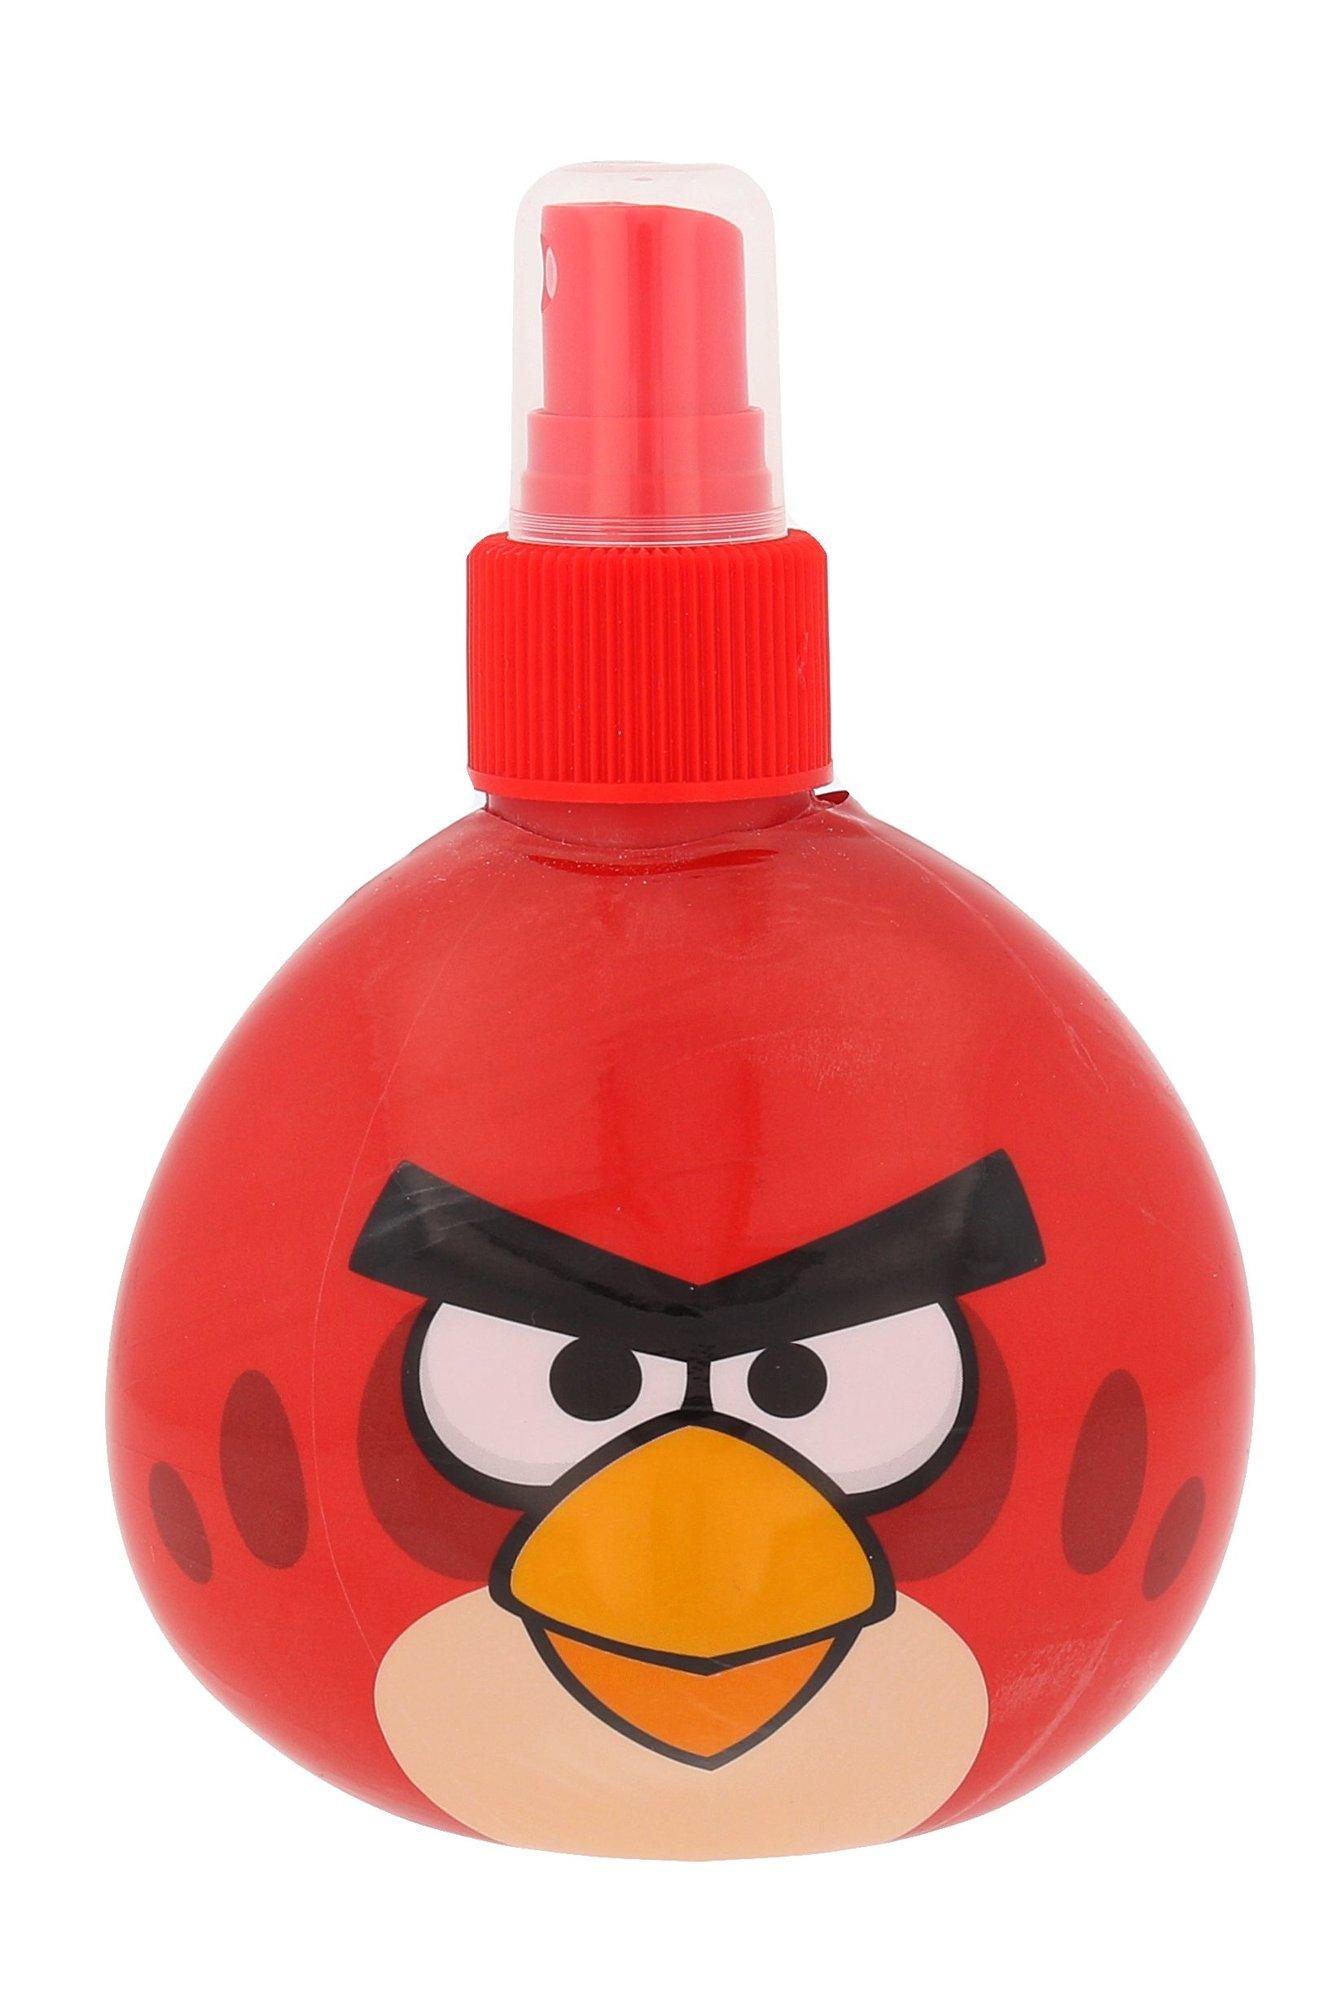 Angry Birds Angry Birds Red Bird Tělový spray 200ml